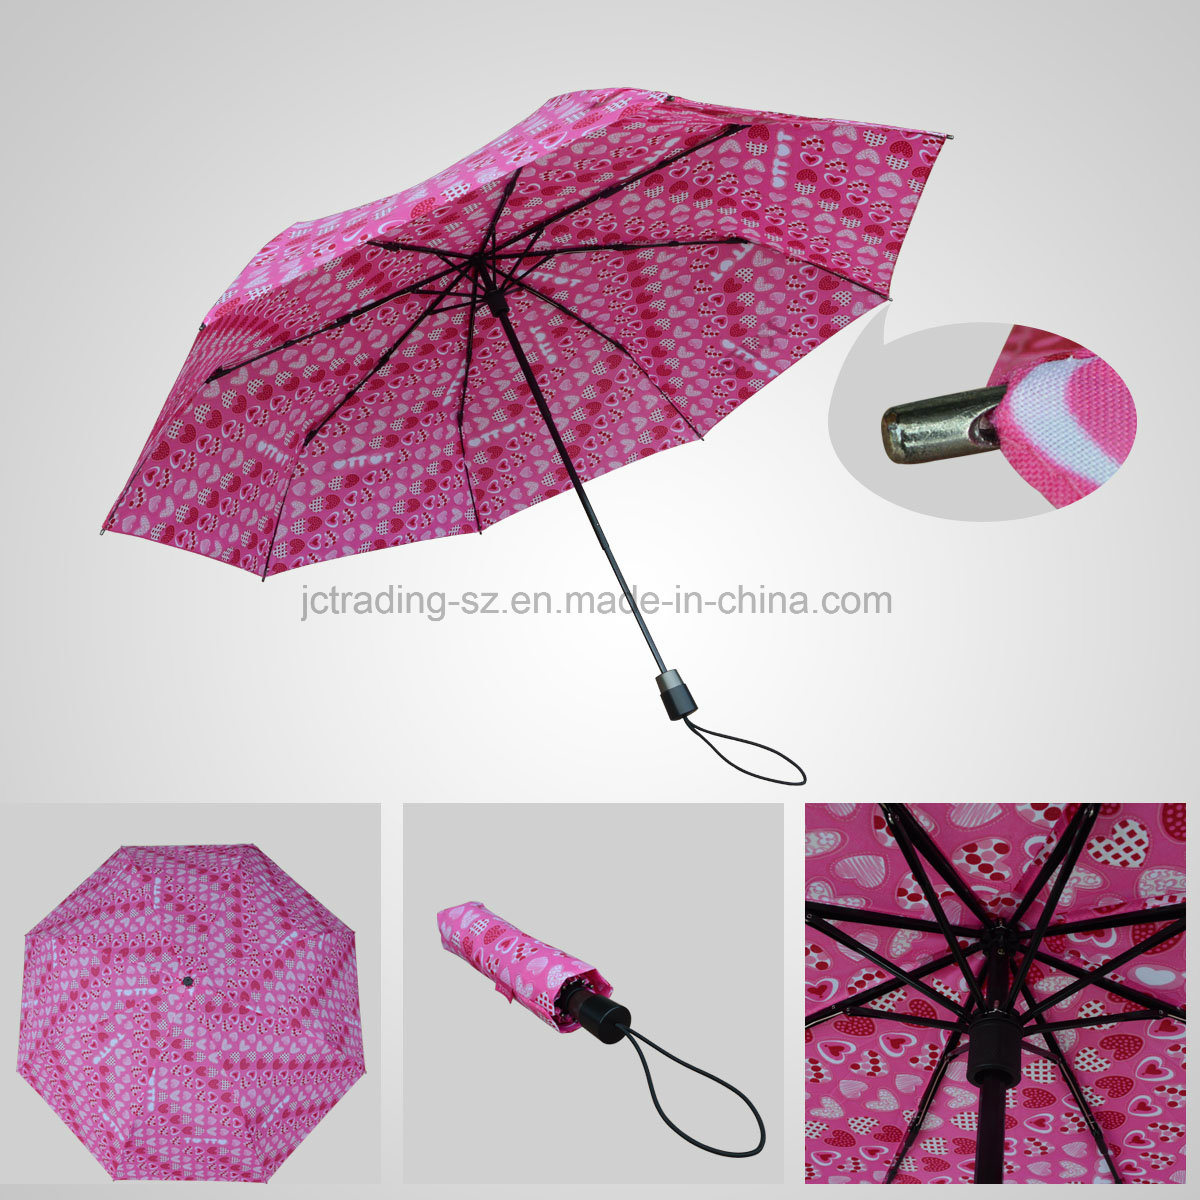 3 Fold Rotating Manual Umbrella Lady Folding Umbrella (JF-MXZ301)